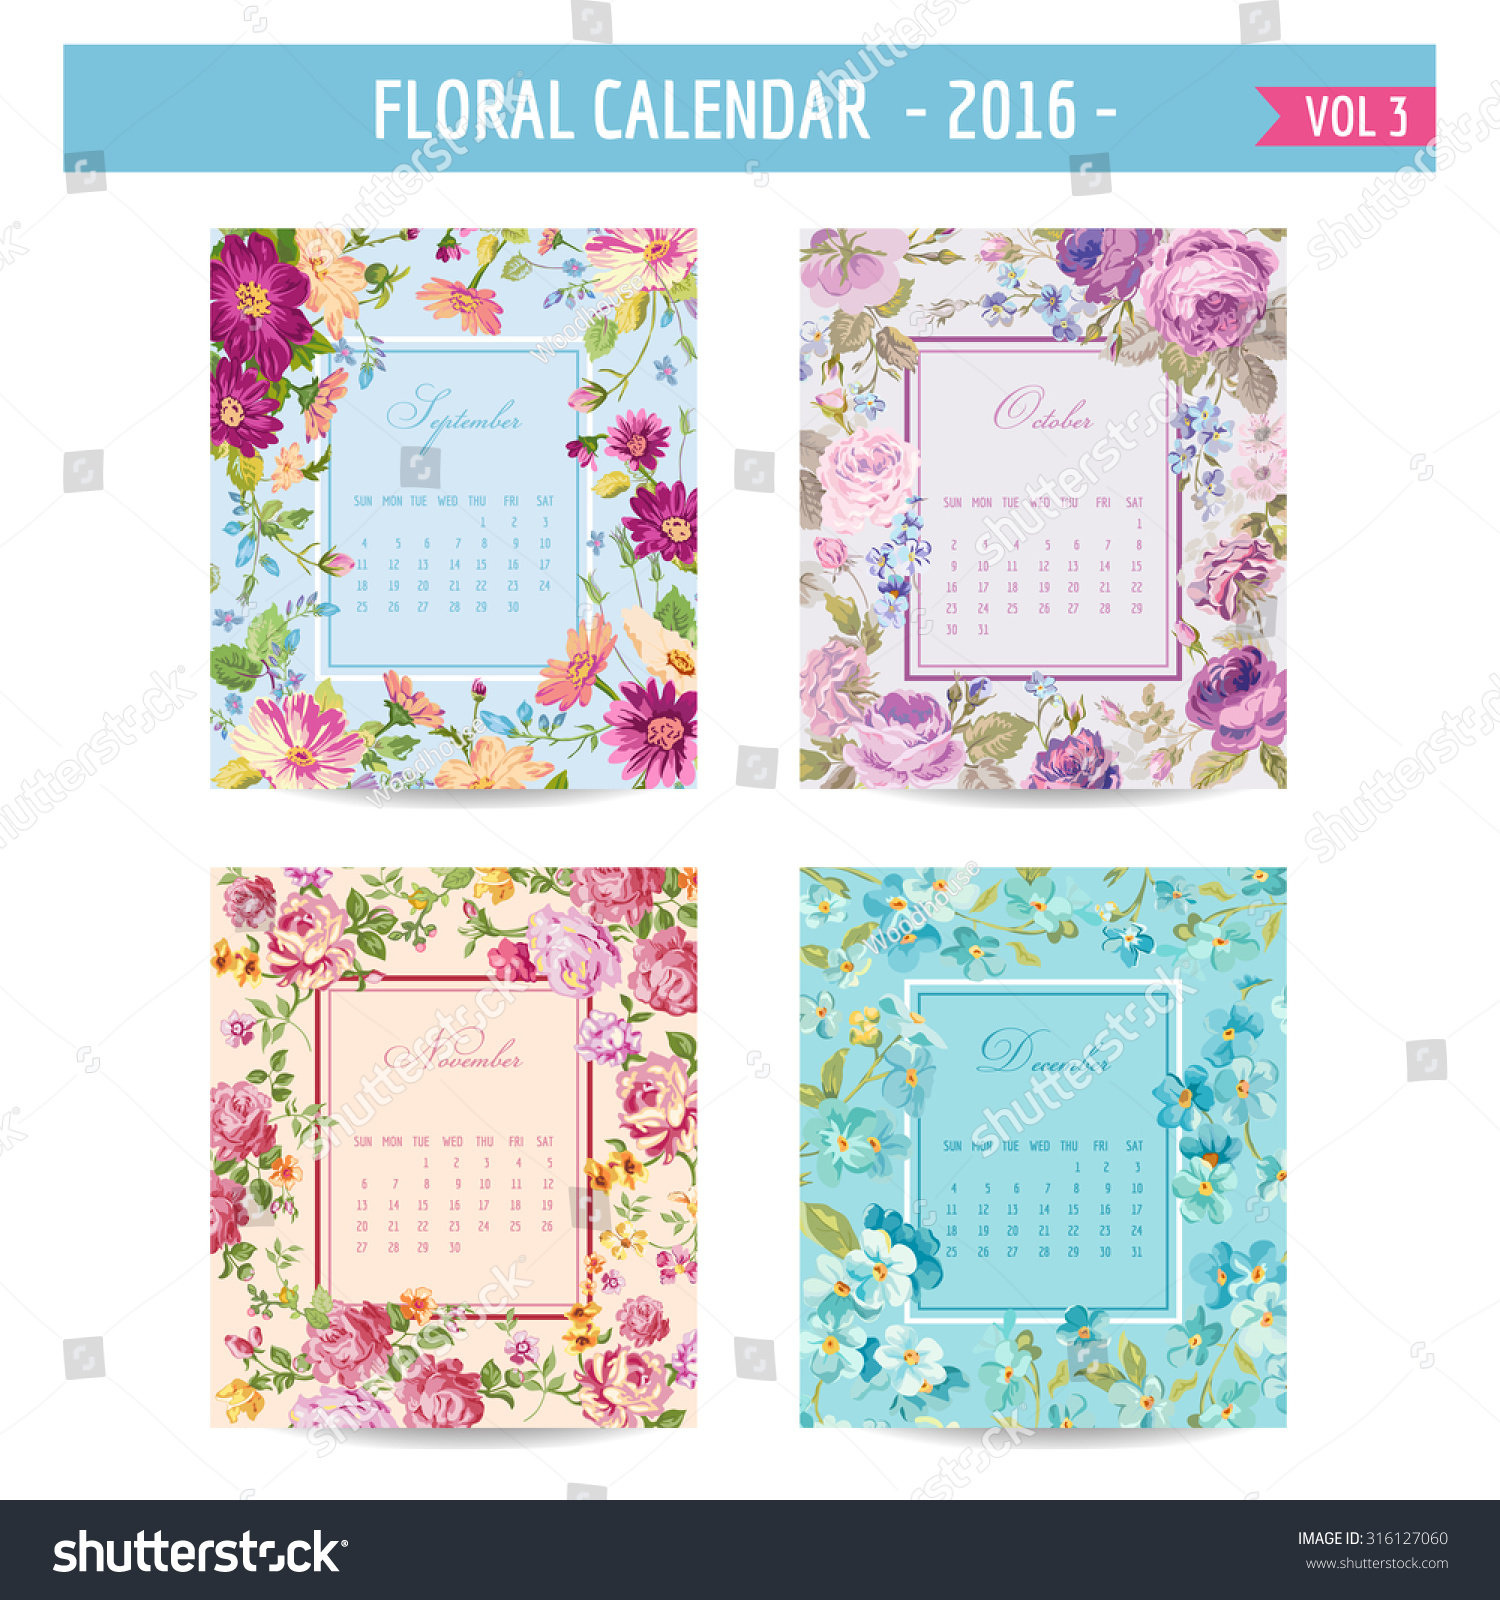 Calendar Vintage Vector : Floral calendar vintage flowers vector stock